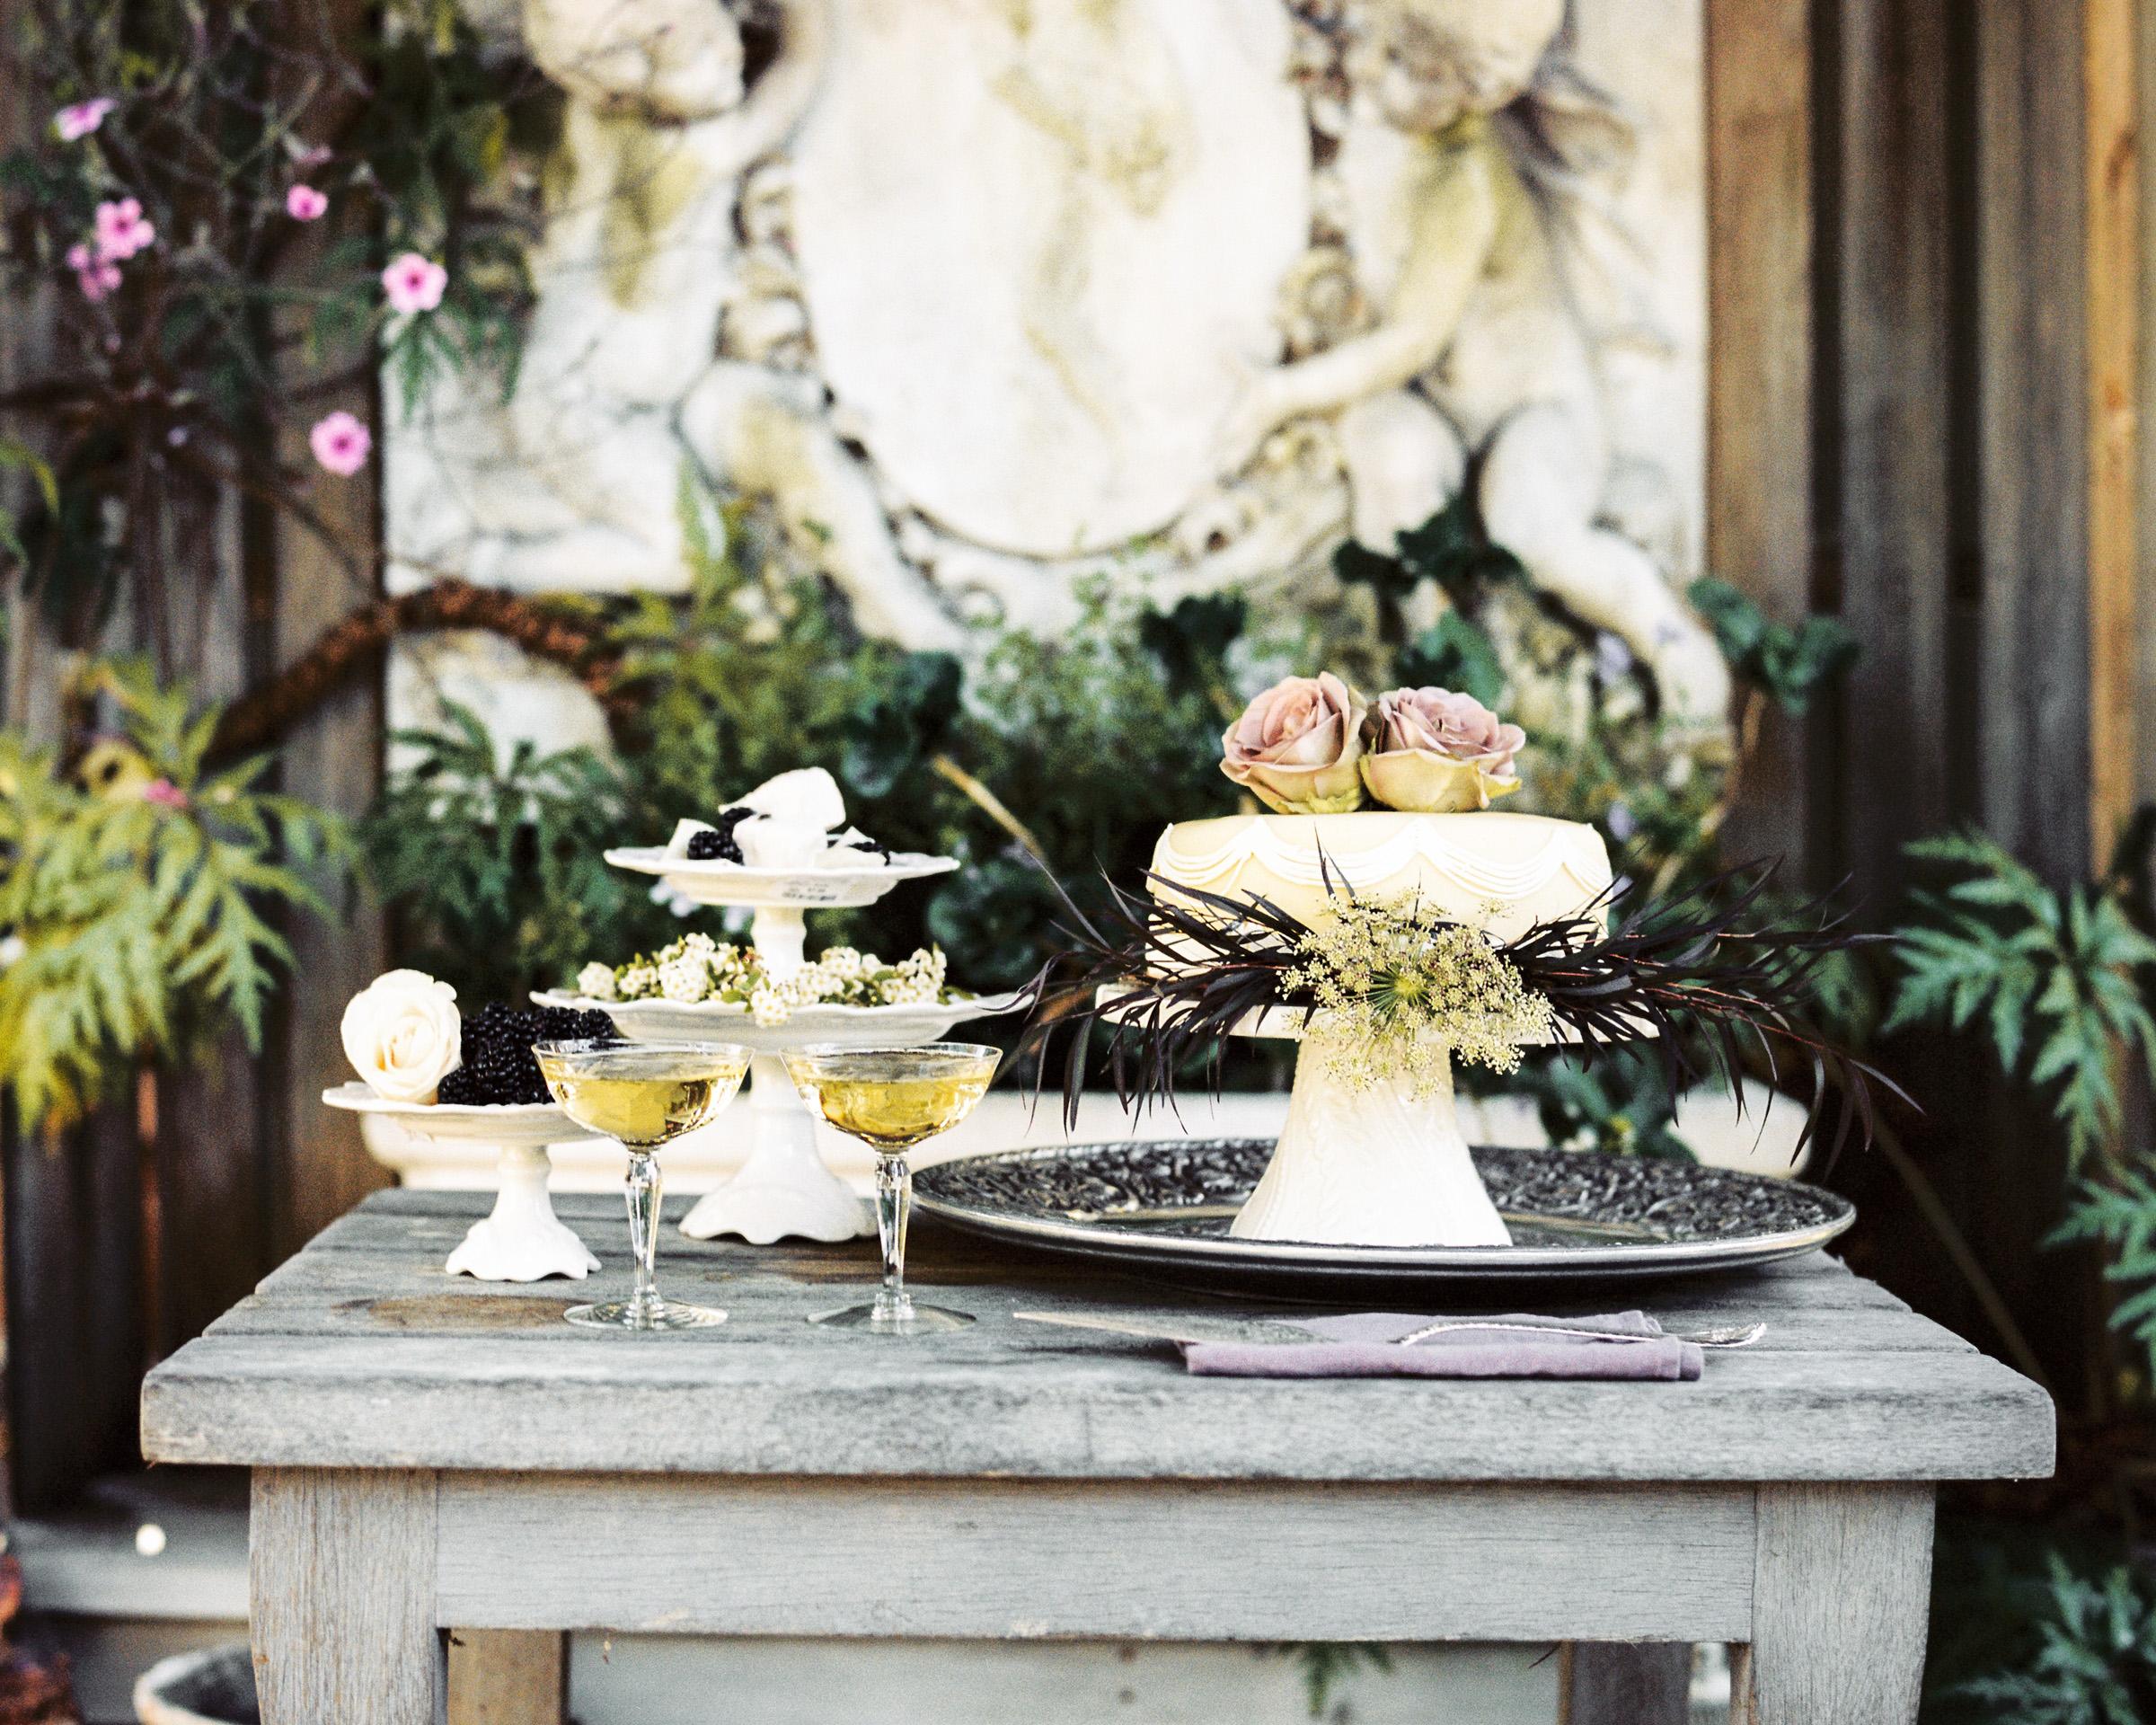 The-Folley-Estate-Wedding-Dessert-Table-.jpg